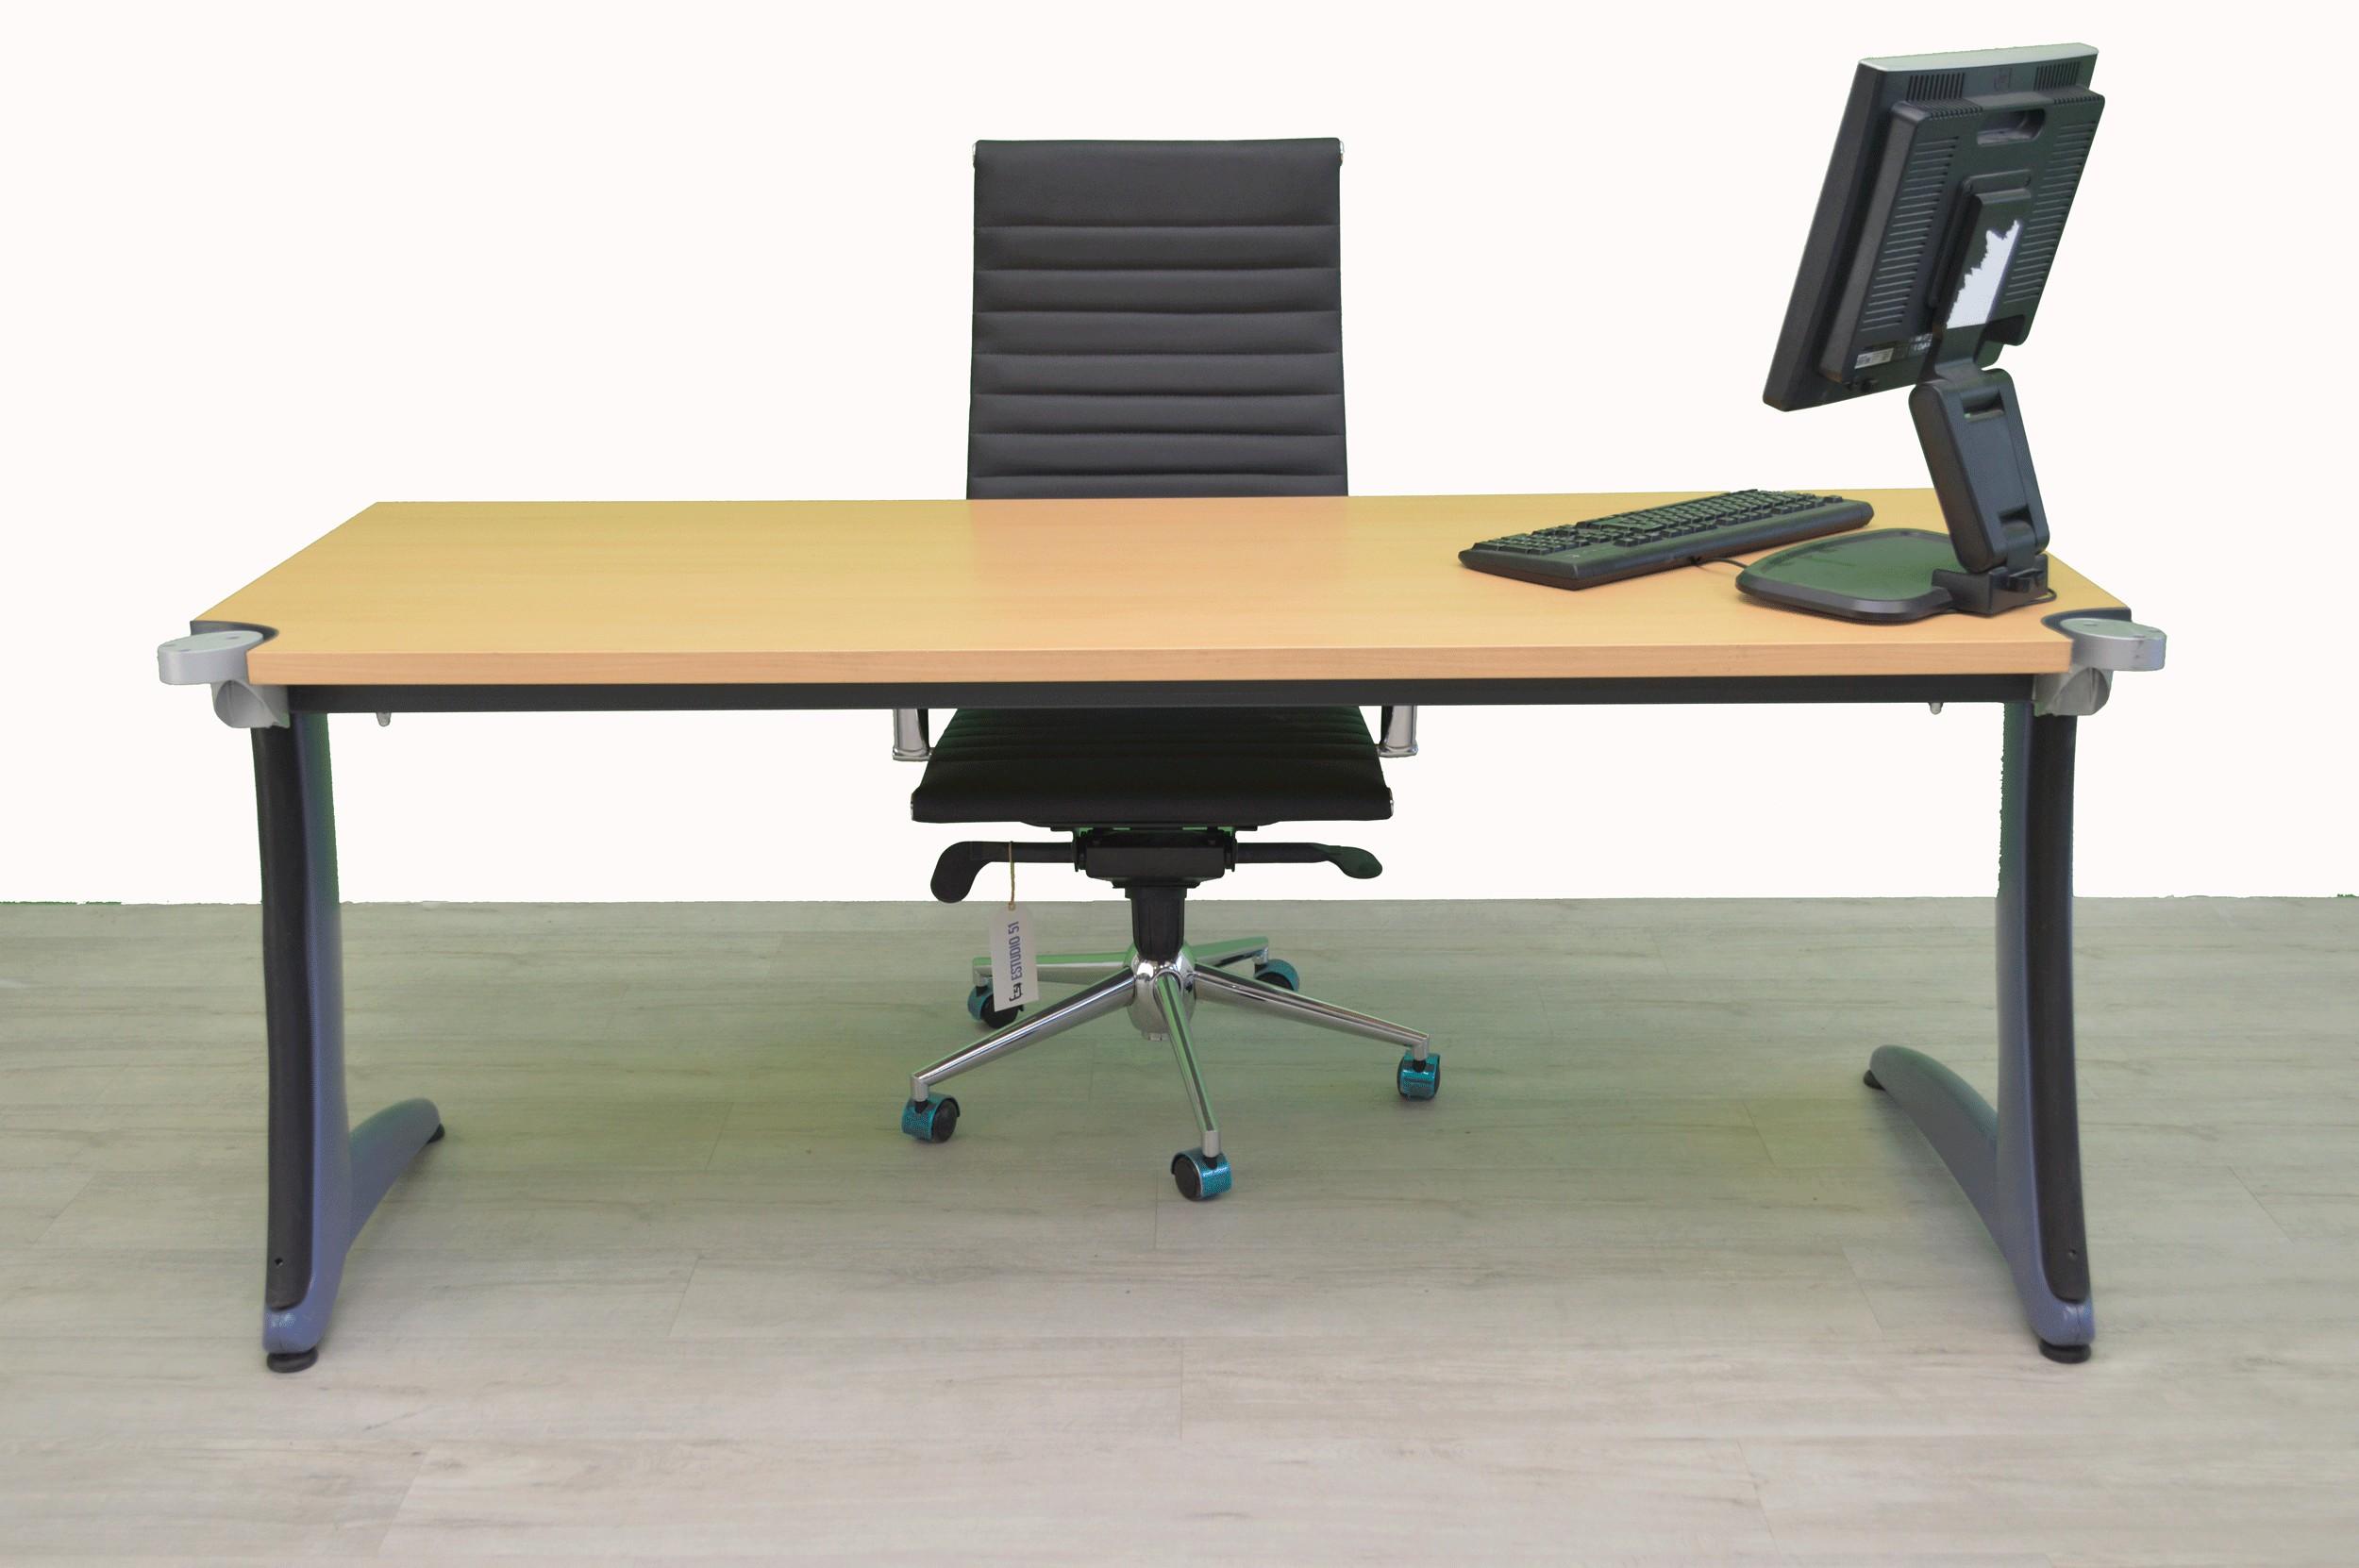 Mesa Oficina Steelcase recta - Estudio 51 (A15 Factory S.L.)